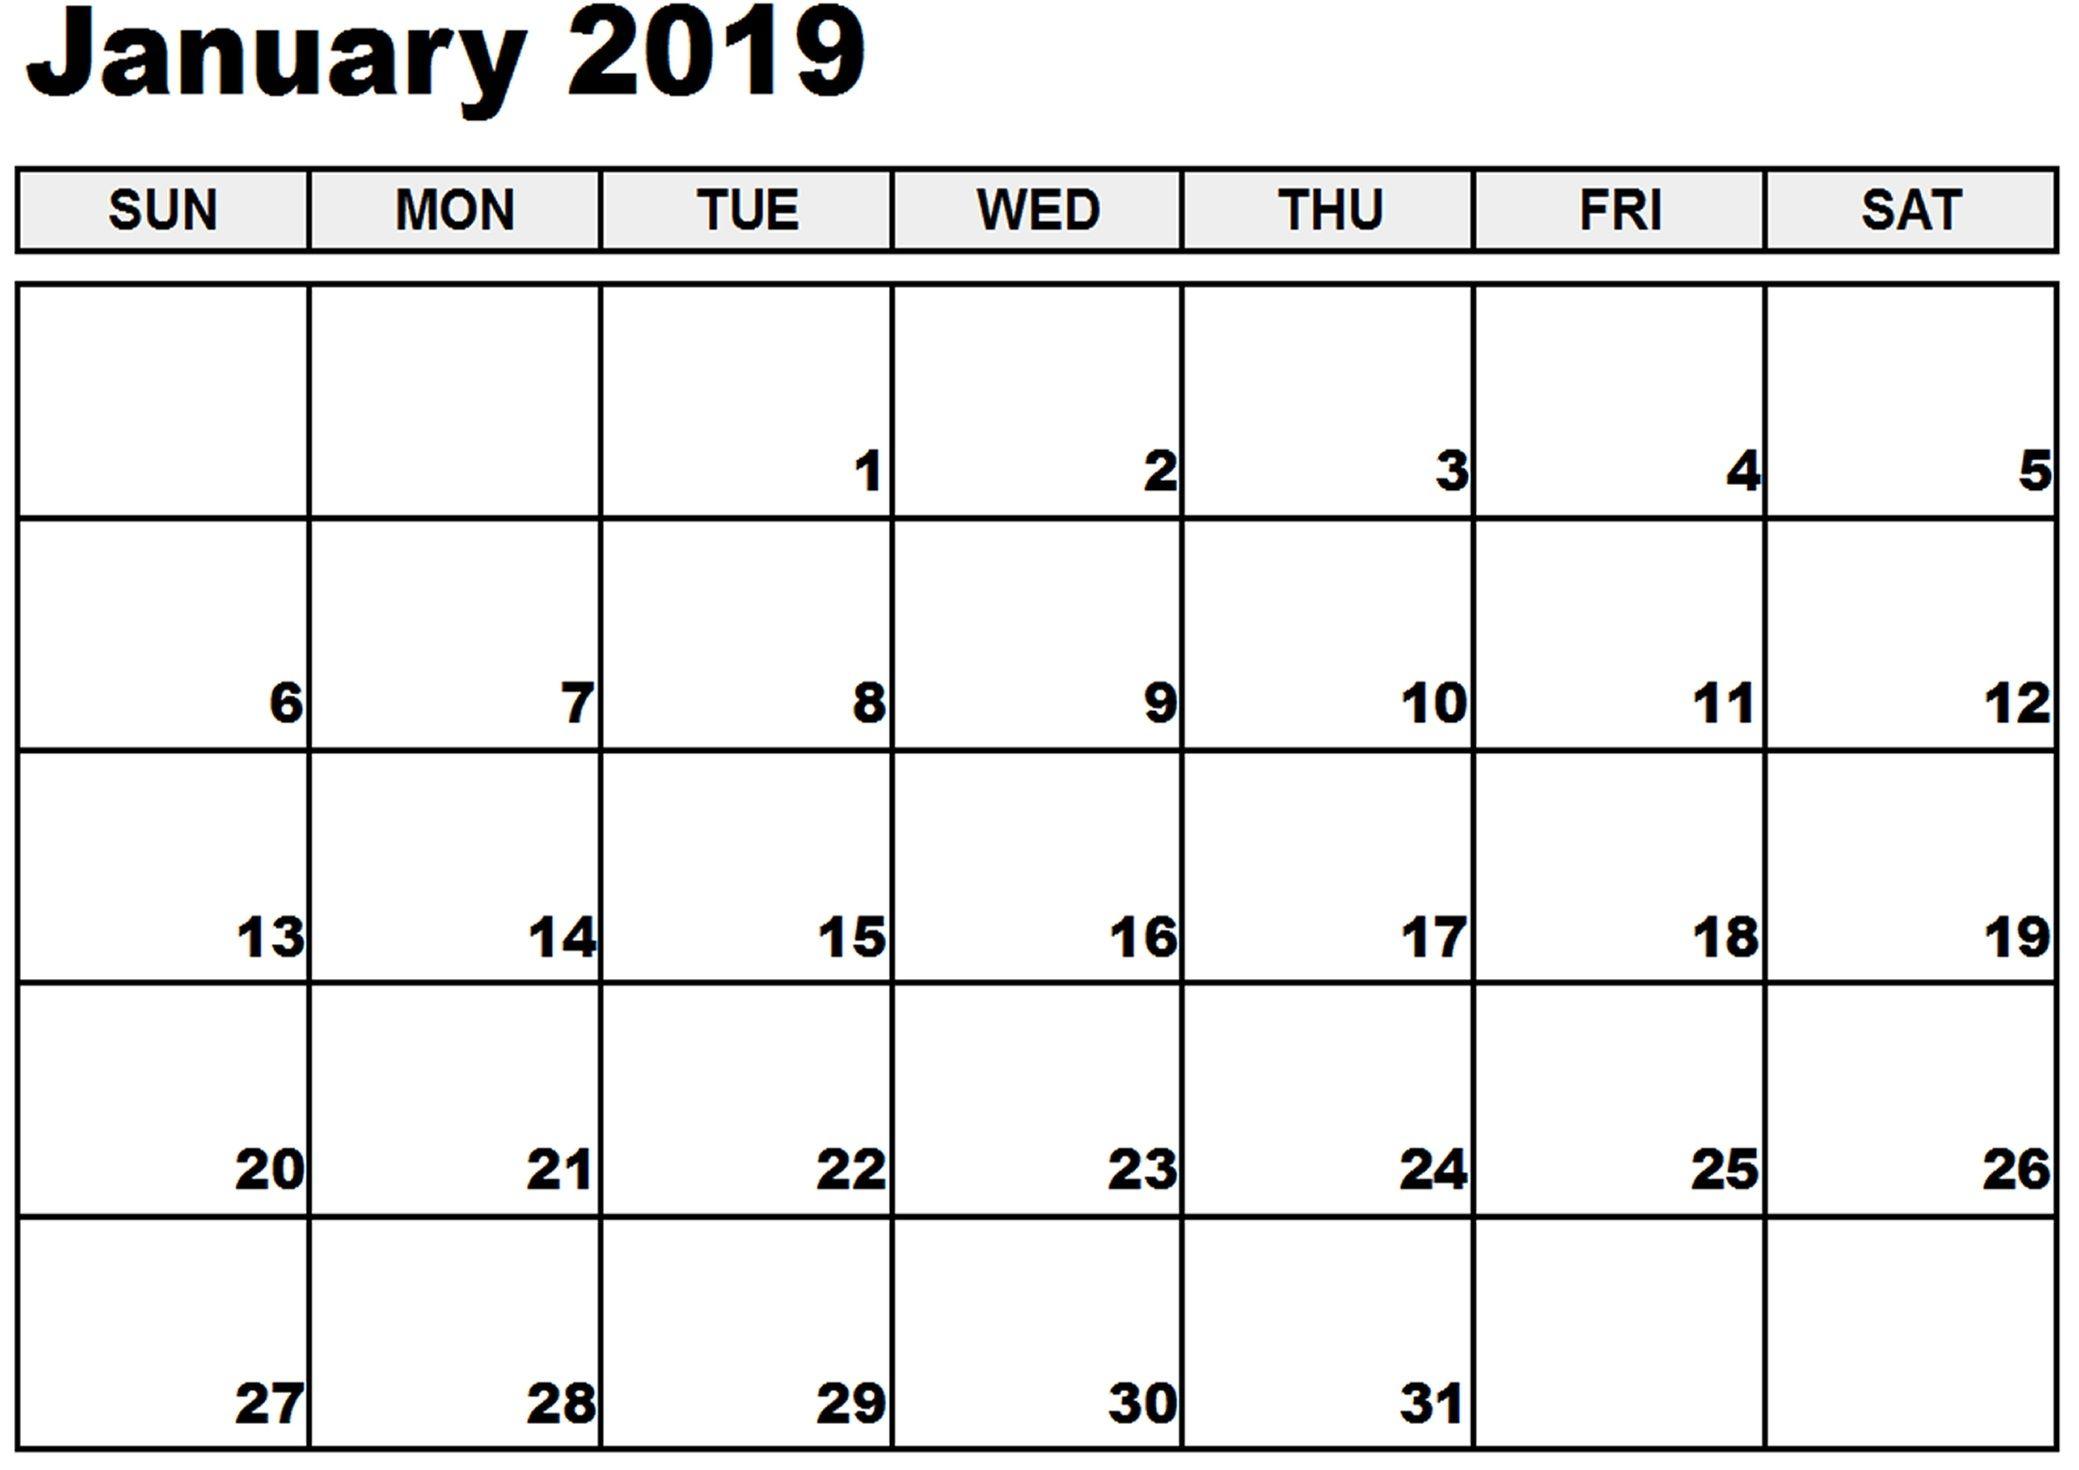 November 2017 - January 2019 Calendar january 2019 printable calendar january 2019 calendar